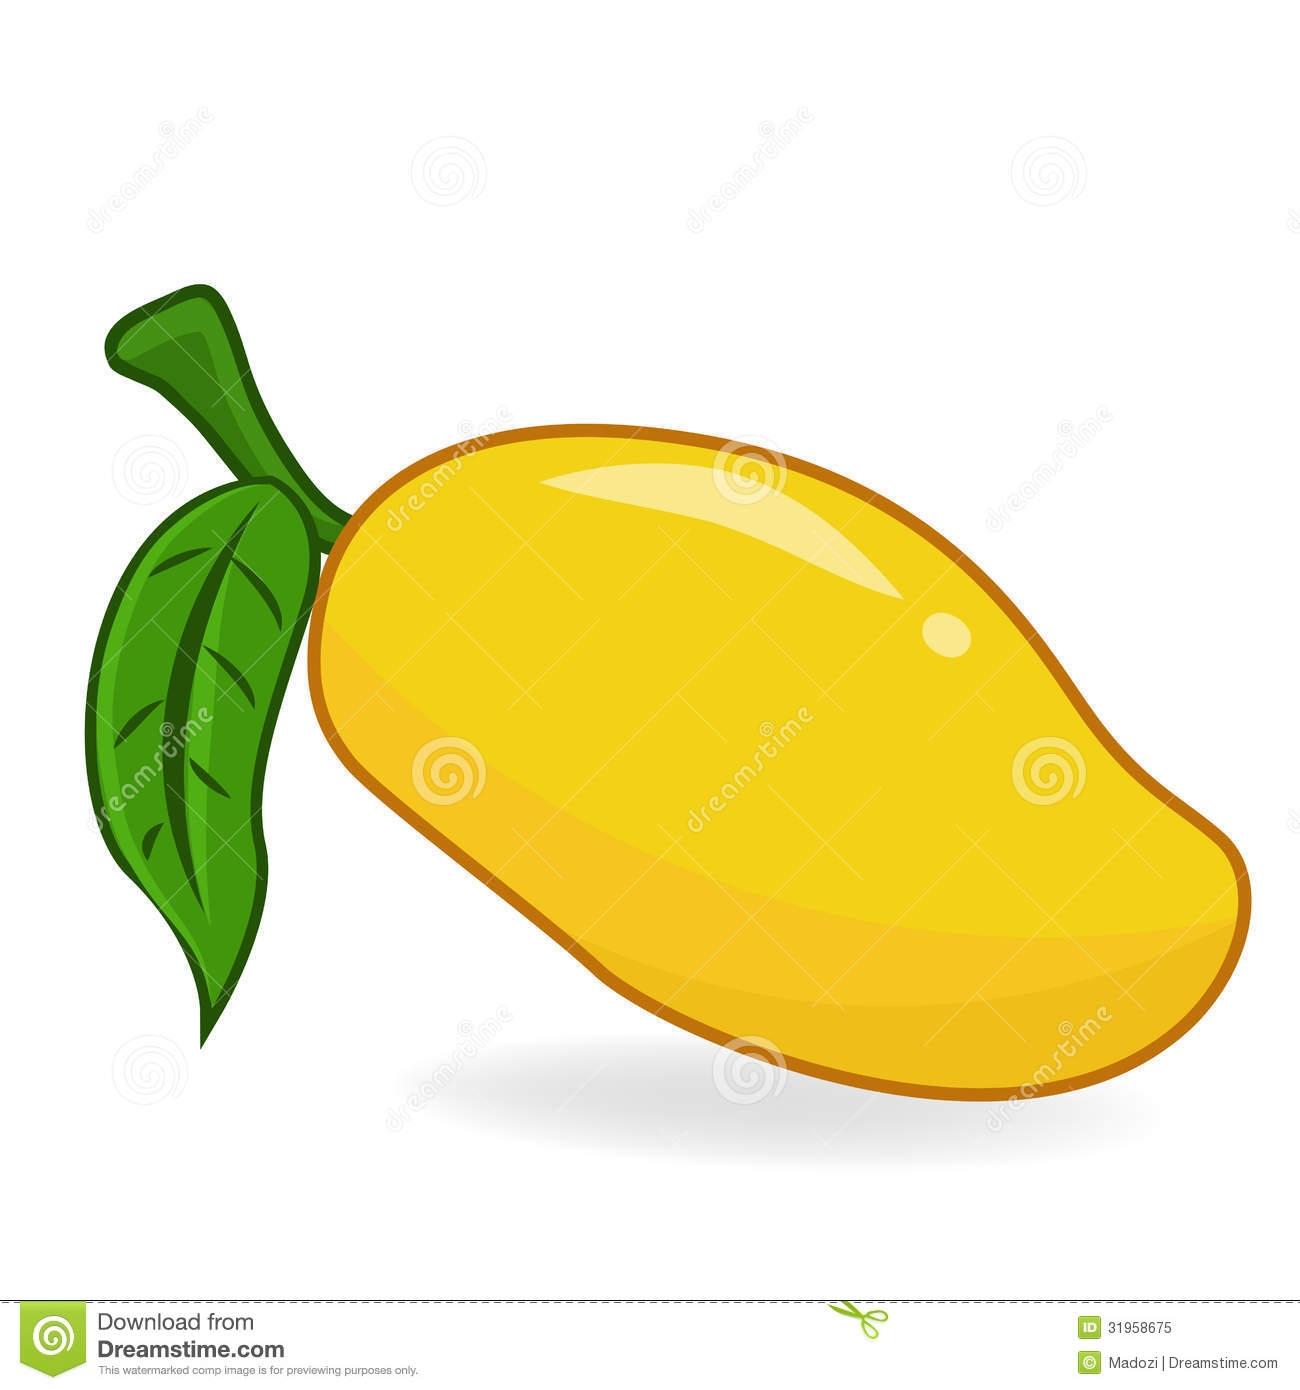 Mango clipart mango fruit Clipart Mango Yellow Cli Mango